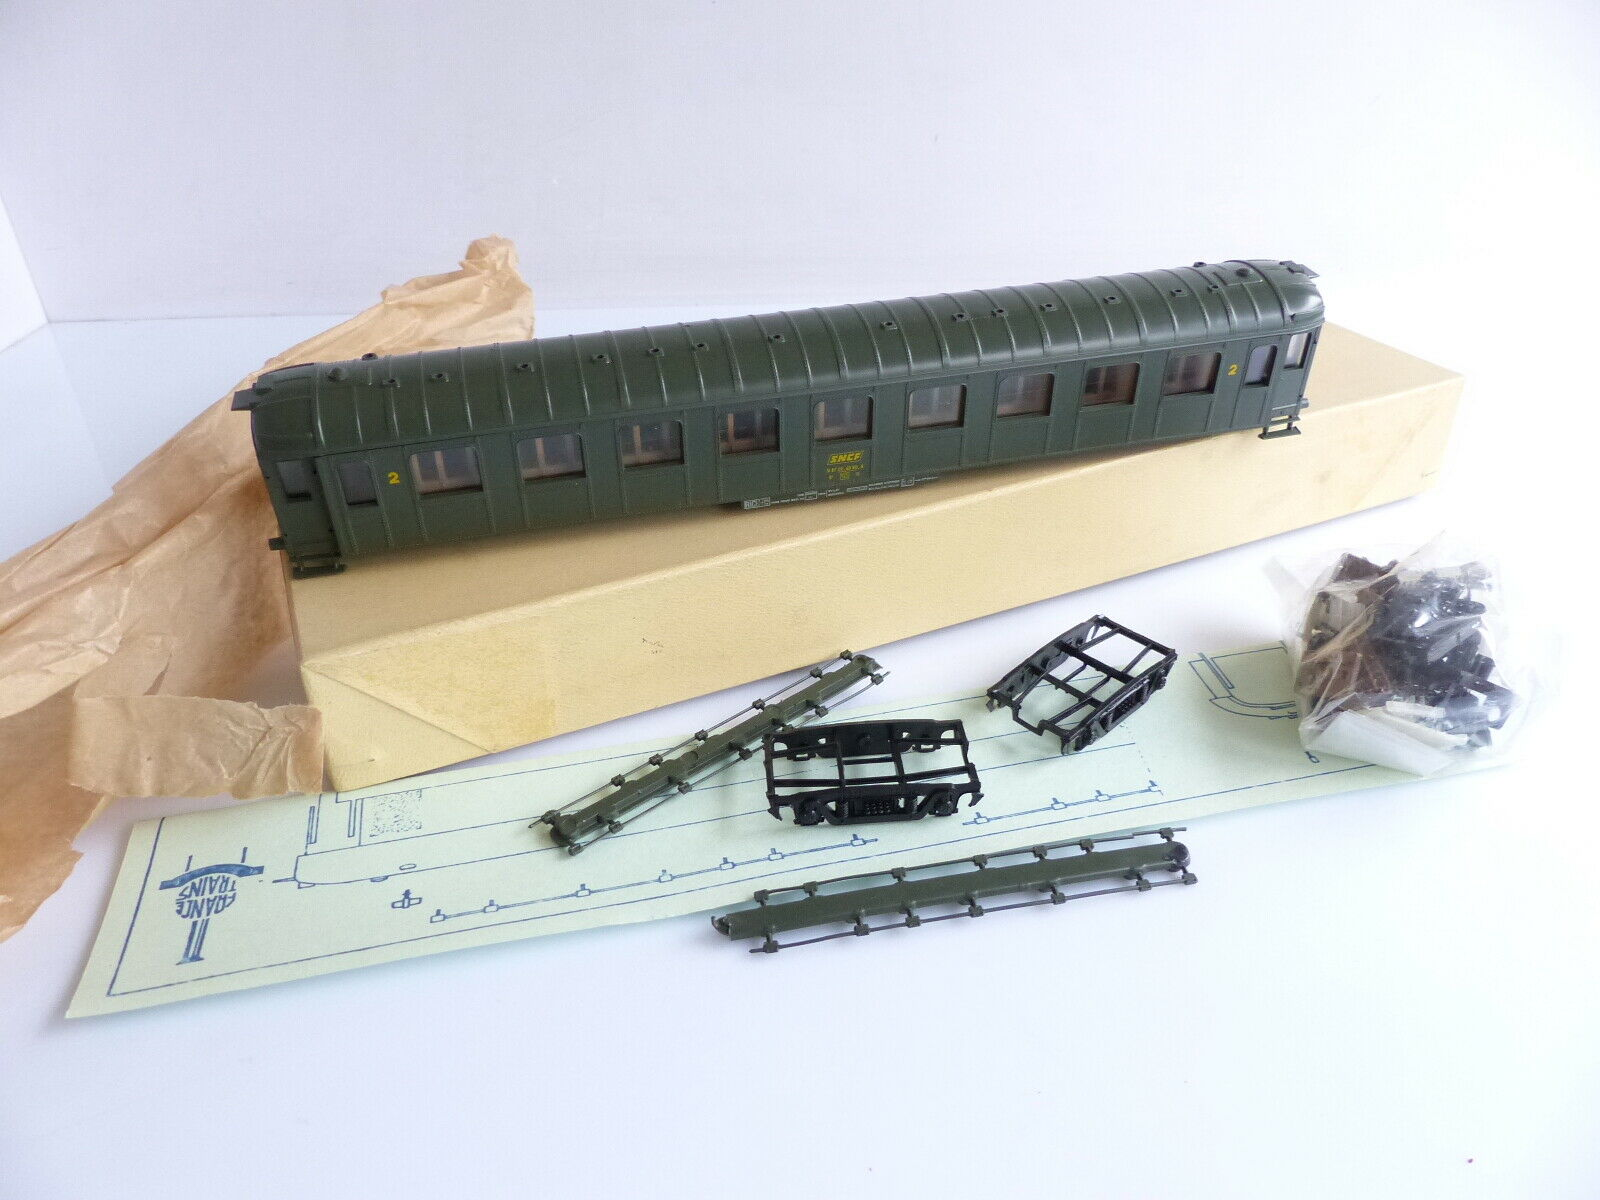 FRANCE i treni 532   272 VOITURE VOITURE VOITURE VOYAGEURS OCEM 2E classeE A MONTER 0c9c69